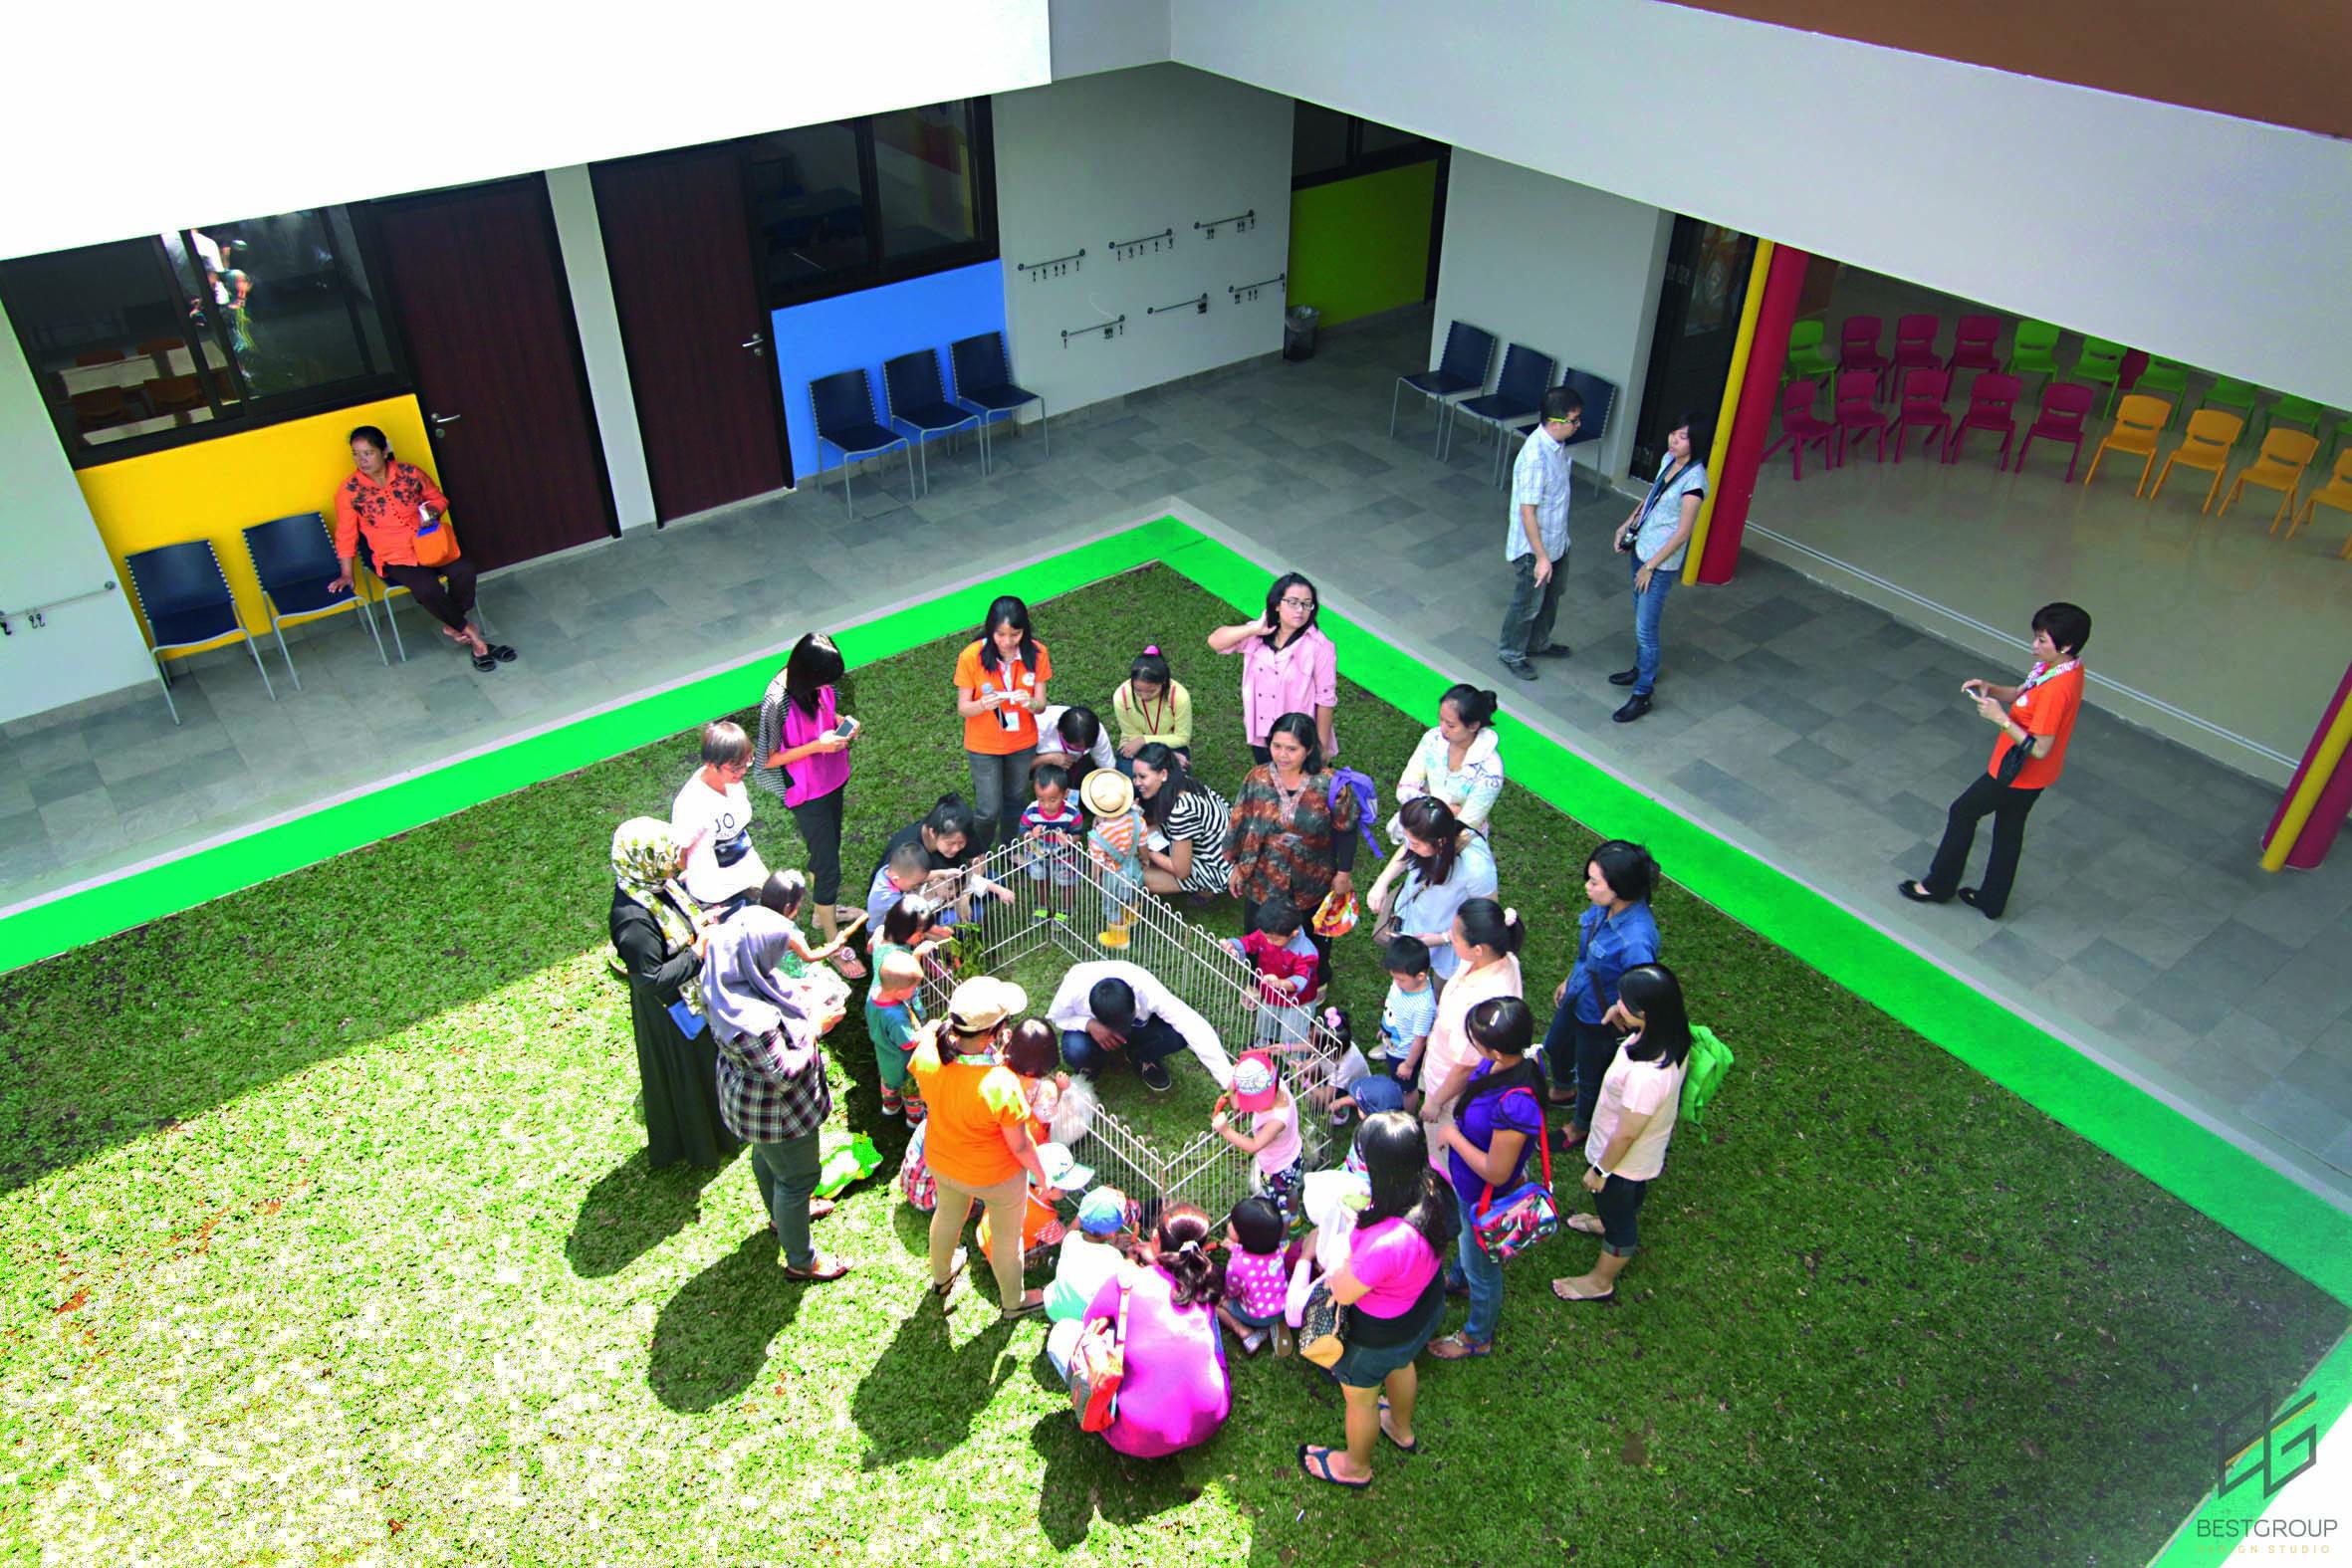 Best Group Design Studio Starland Kindergarten  Jl. Sersan Bajuri No.99, Isola, Sukasari, Kota Bandung, Jawa Barat 40154, Indonesia Jl. Sersan Bajuri No.99, Isola, Sukasari, Kota Bandung, Jawa Barat 40154, Indonesia Best-Group-Design-Studio-Starland-Kindergarten-   68403